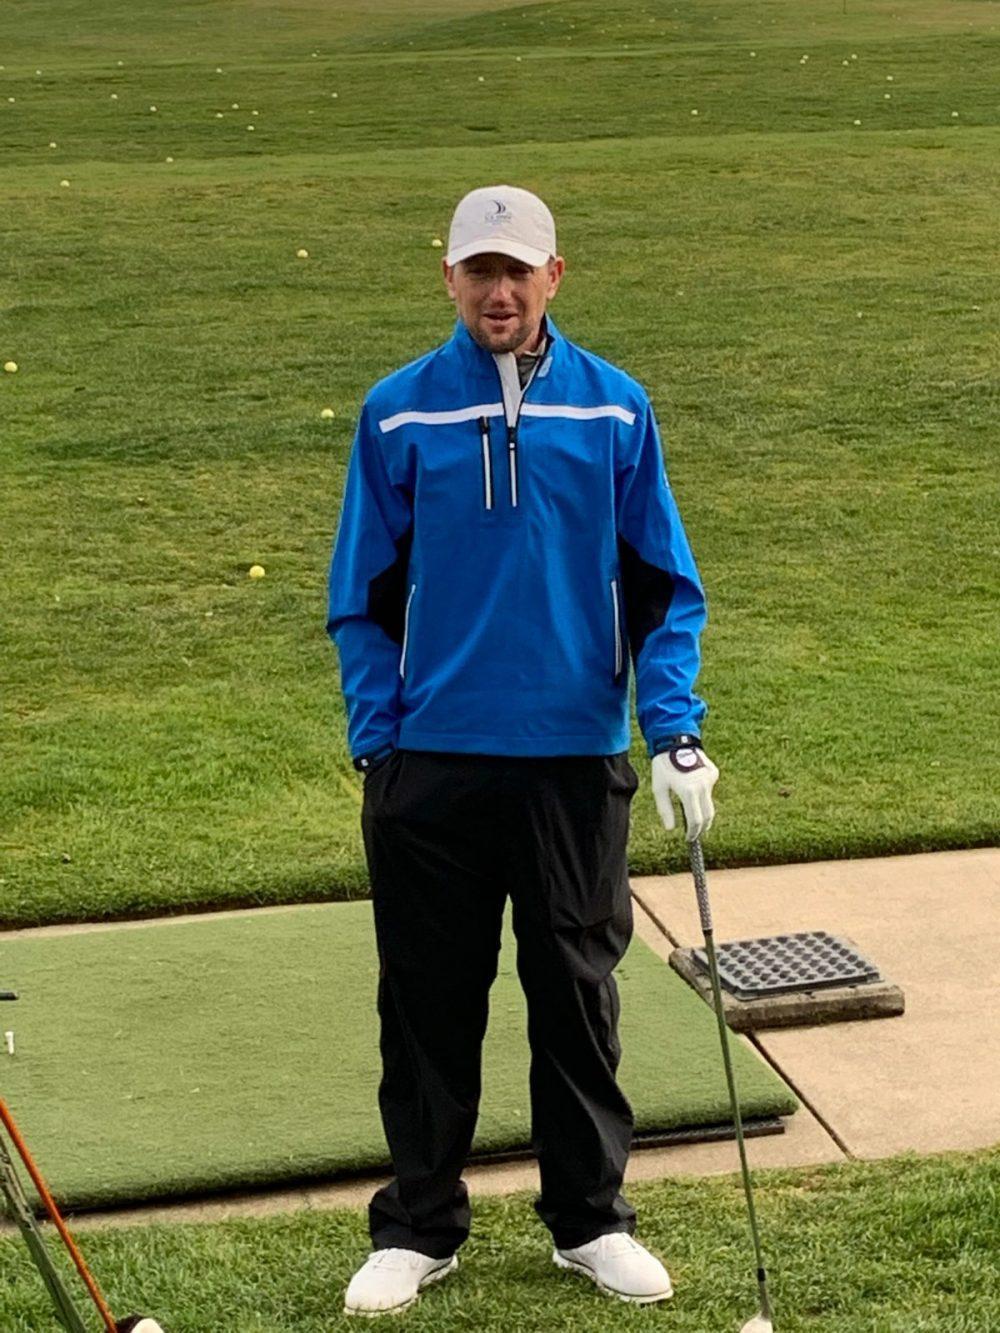 PGA Pro Jason Allred